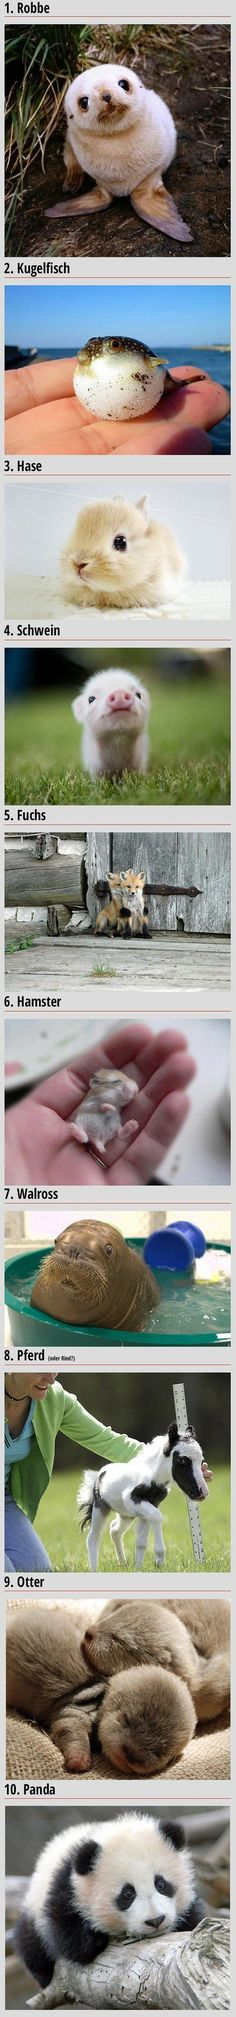 Die süßesten Tierbabys der Welt